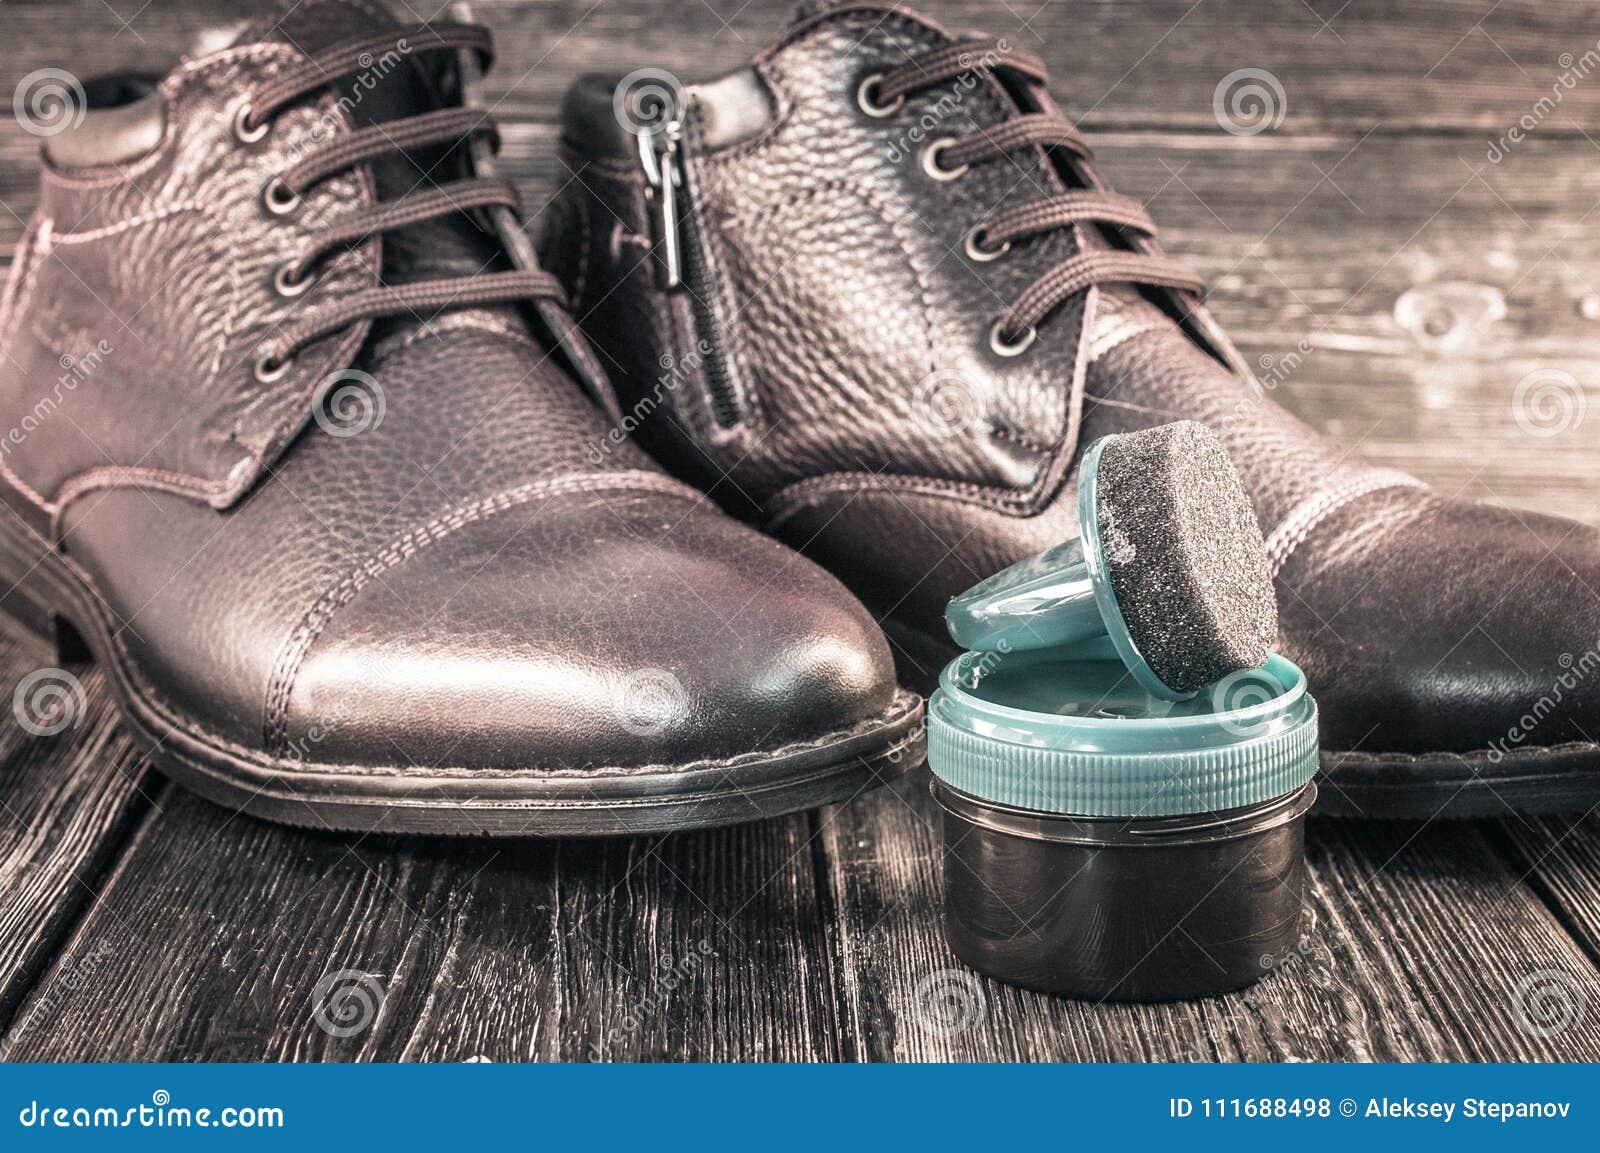 Winter Boots And Shoe Polish Stock Photo Image Of Clothing